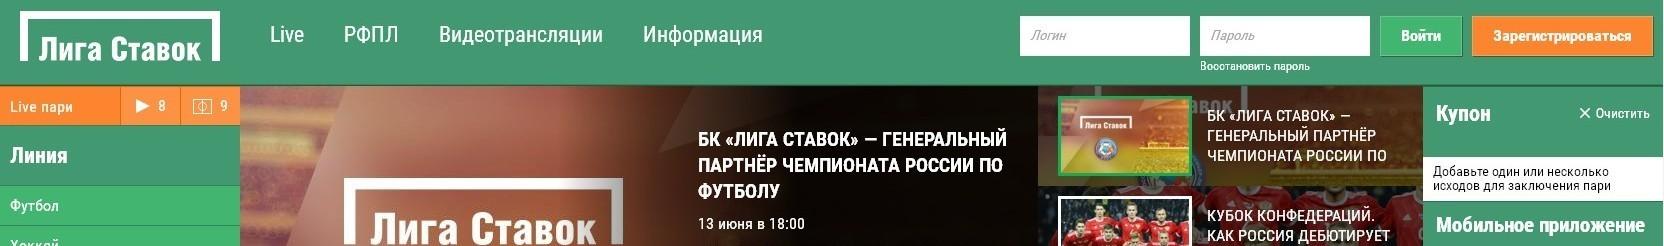 WWW Ligastavok ru. Вид официального сайта